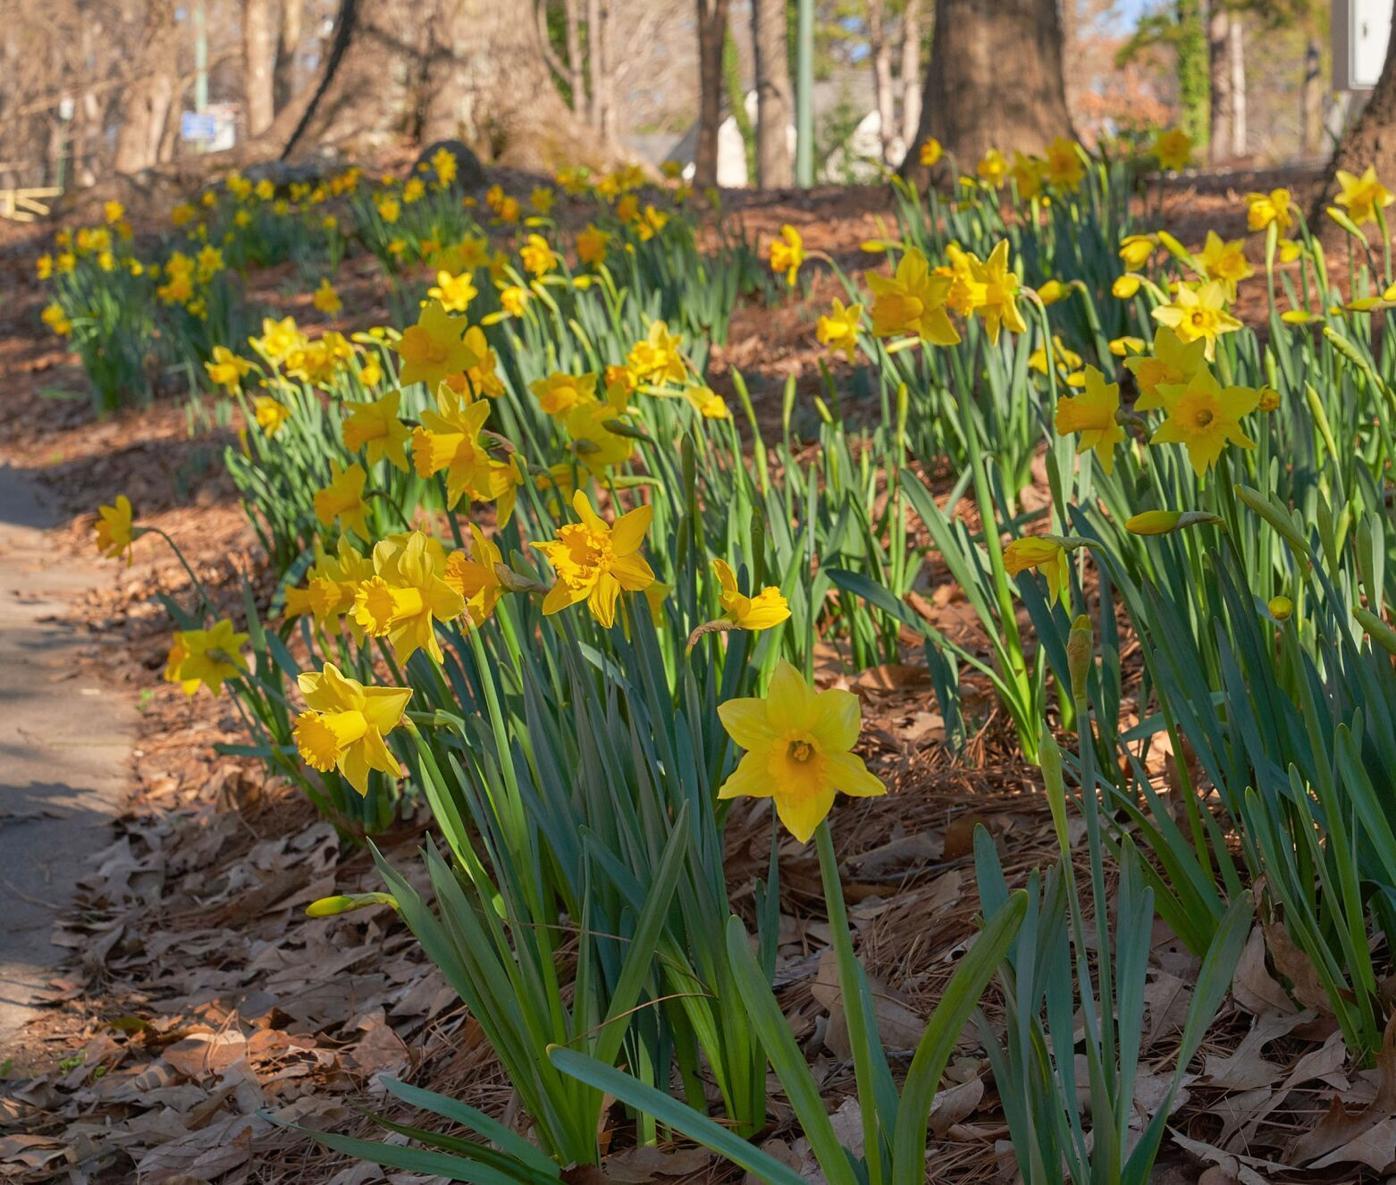 031021_MNS_Daffodil_Project_002 daffodils